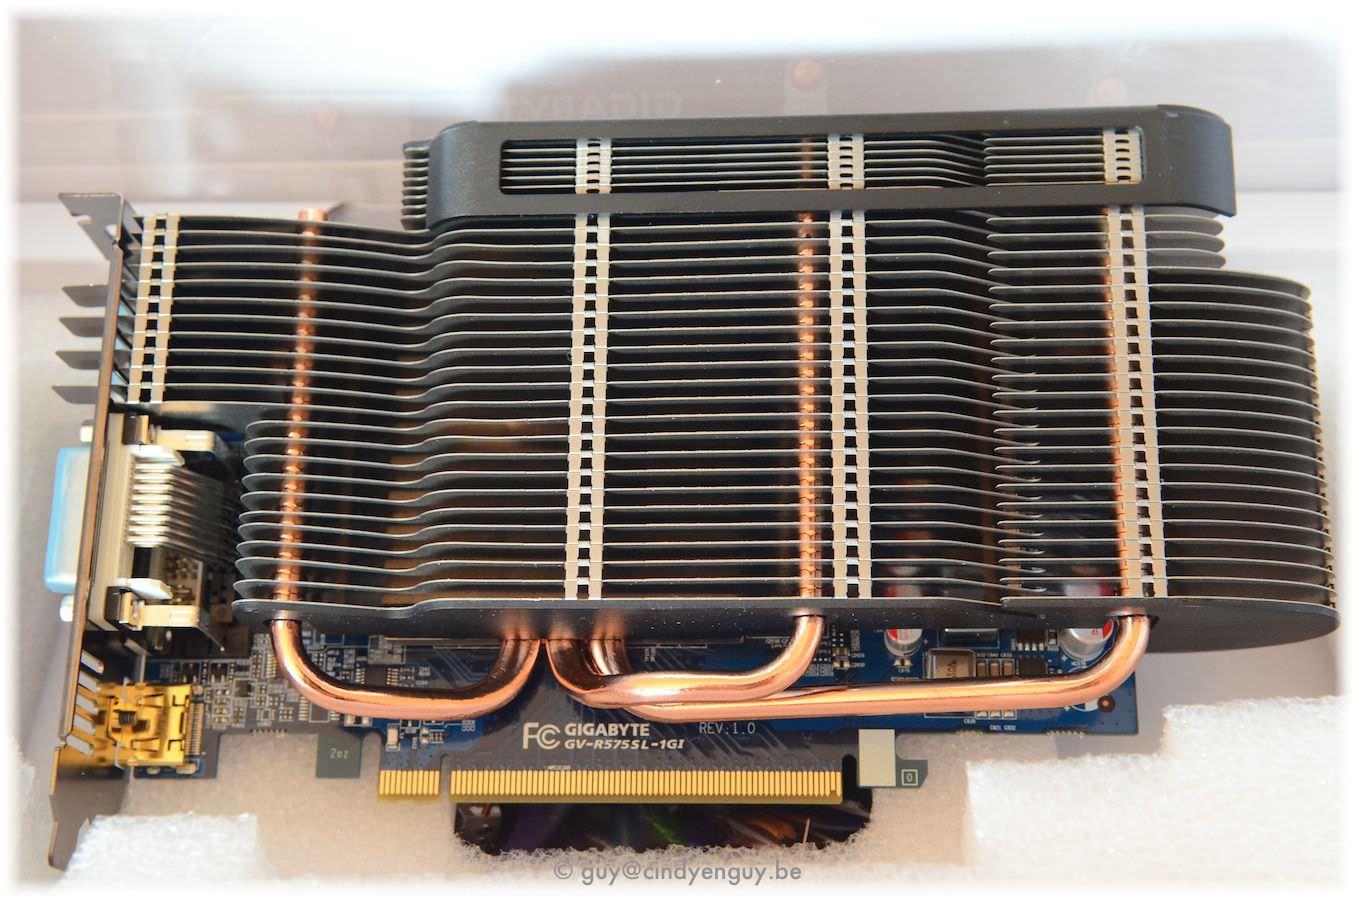 Gigabyte Ati Radeon HD 5750 Passive 1GB (GV-R575SL-1GI)